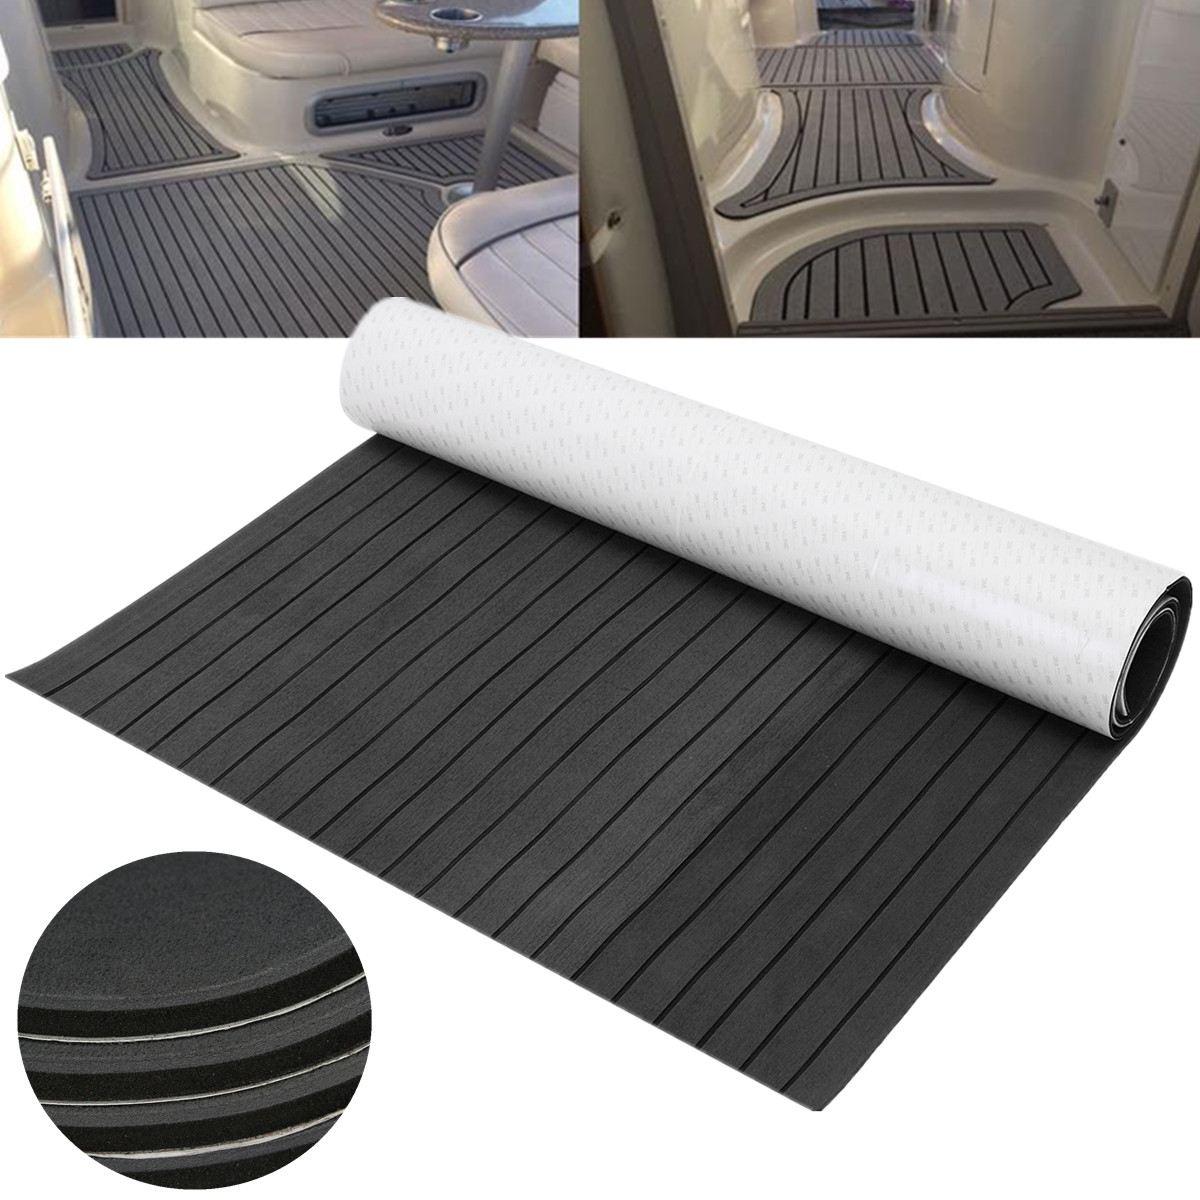 1200mmx2400mm EVA FOAM Mat Teak Sheet RV Touring Car <font><b>Flooring</b></font> Decking Sheet Marine Boat Dark Grey with Black Lines Mat